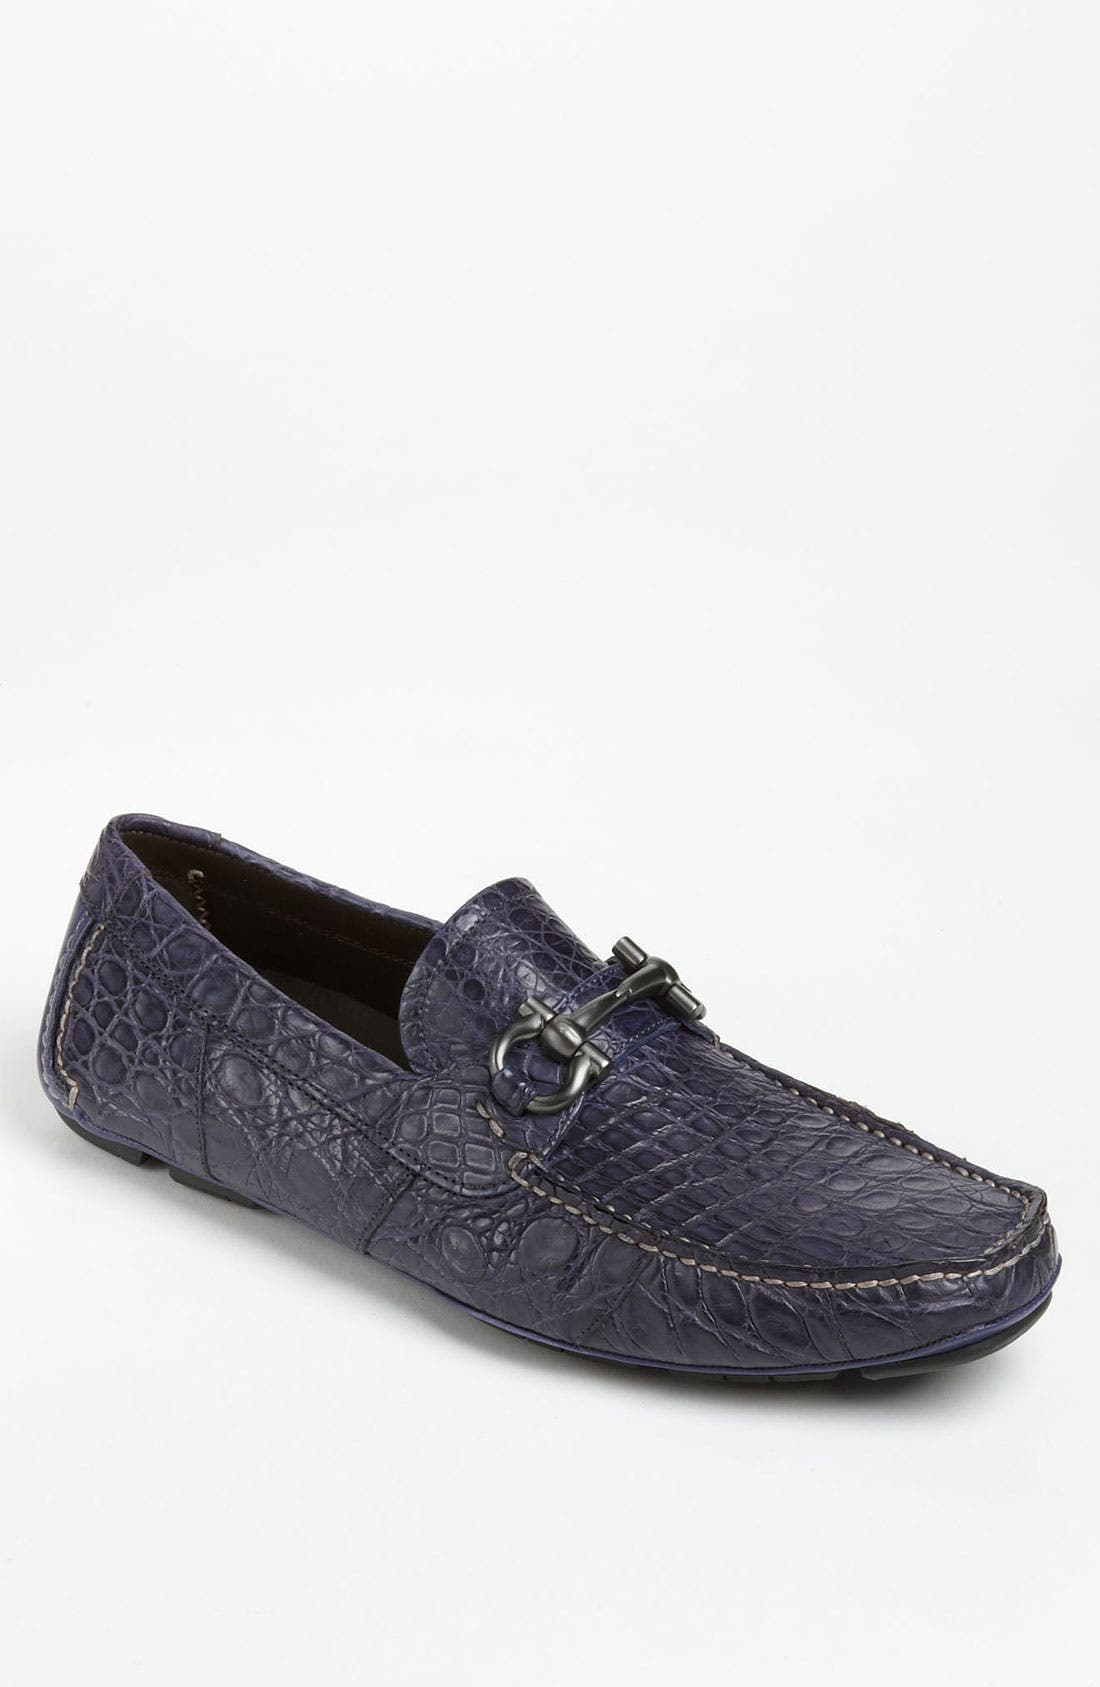 Alternate Image 1 Selected - Salvatore Ferragamo 'Parigi' Crocodile Driving Shoe